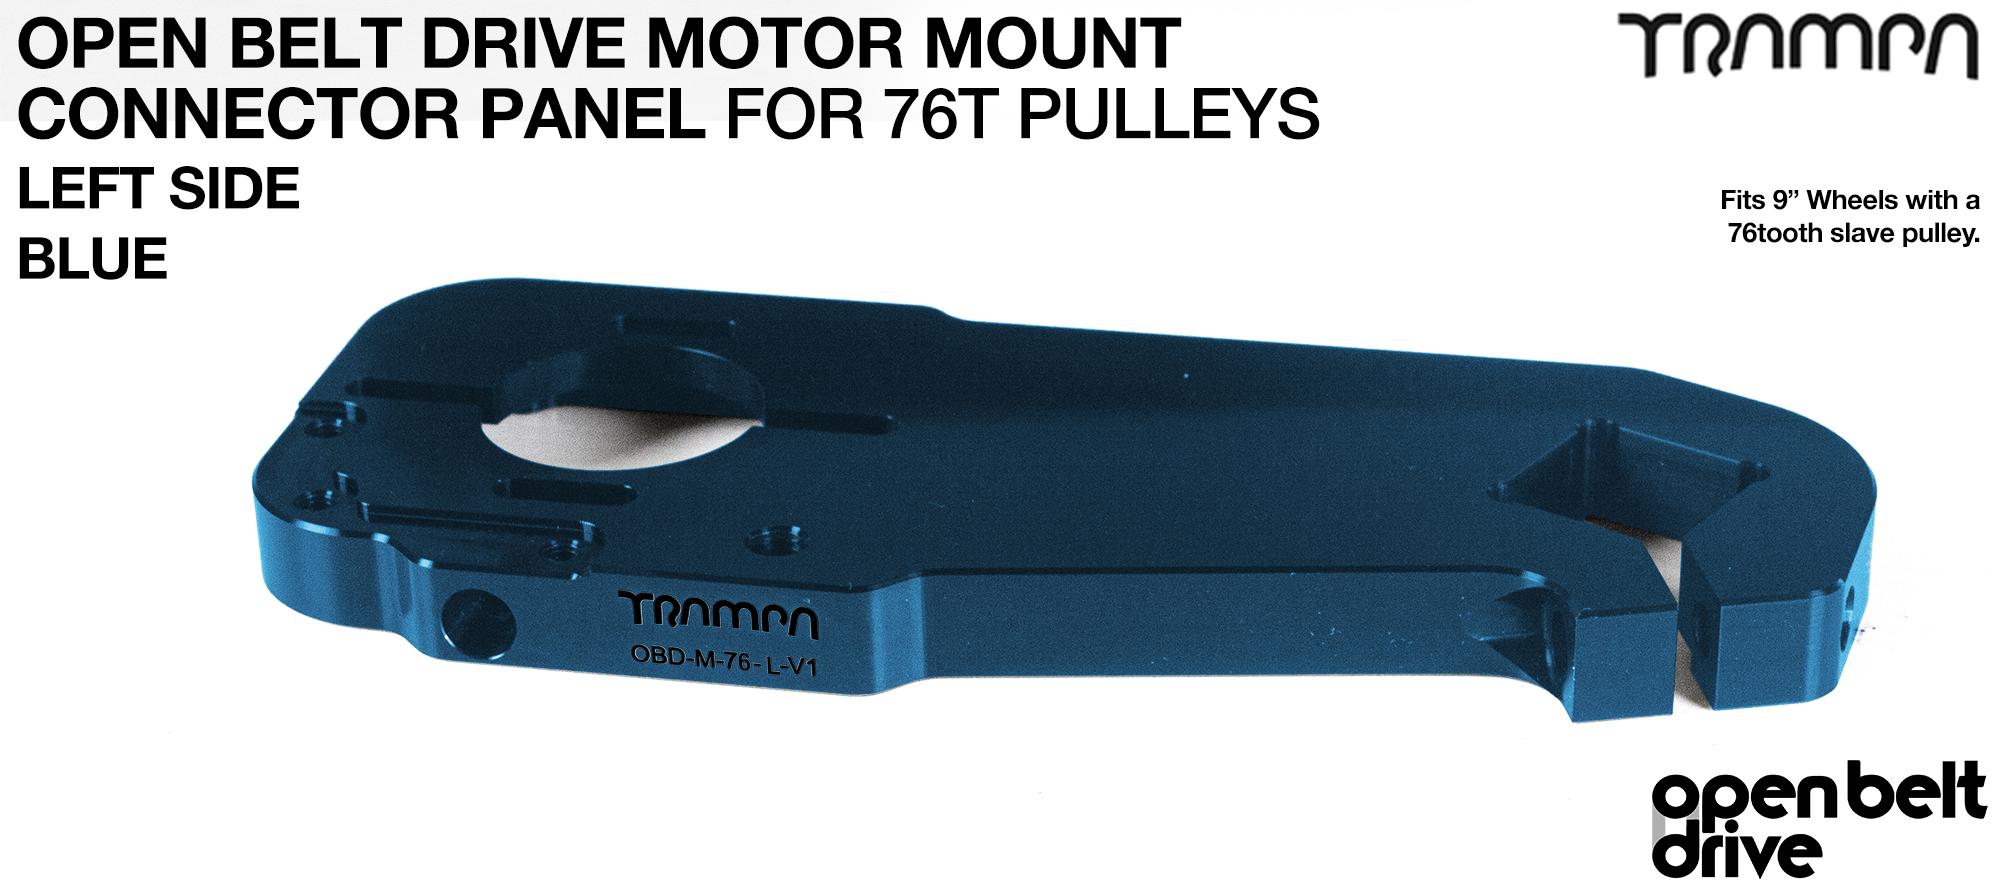 OBD Motor Mount Connector Panel for 76 tooth pulleys - REGULAR - BLUE